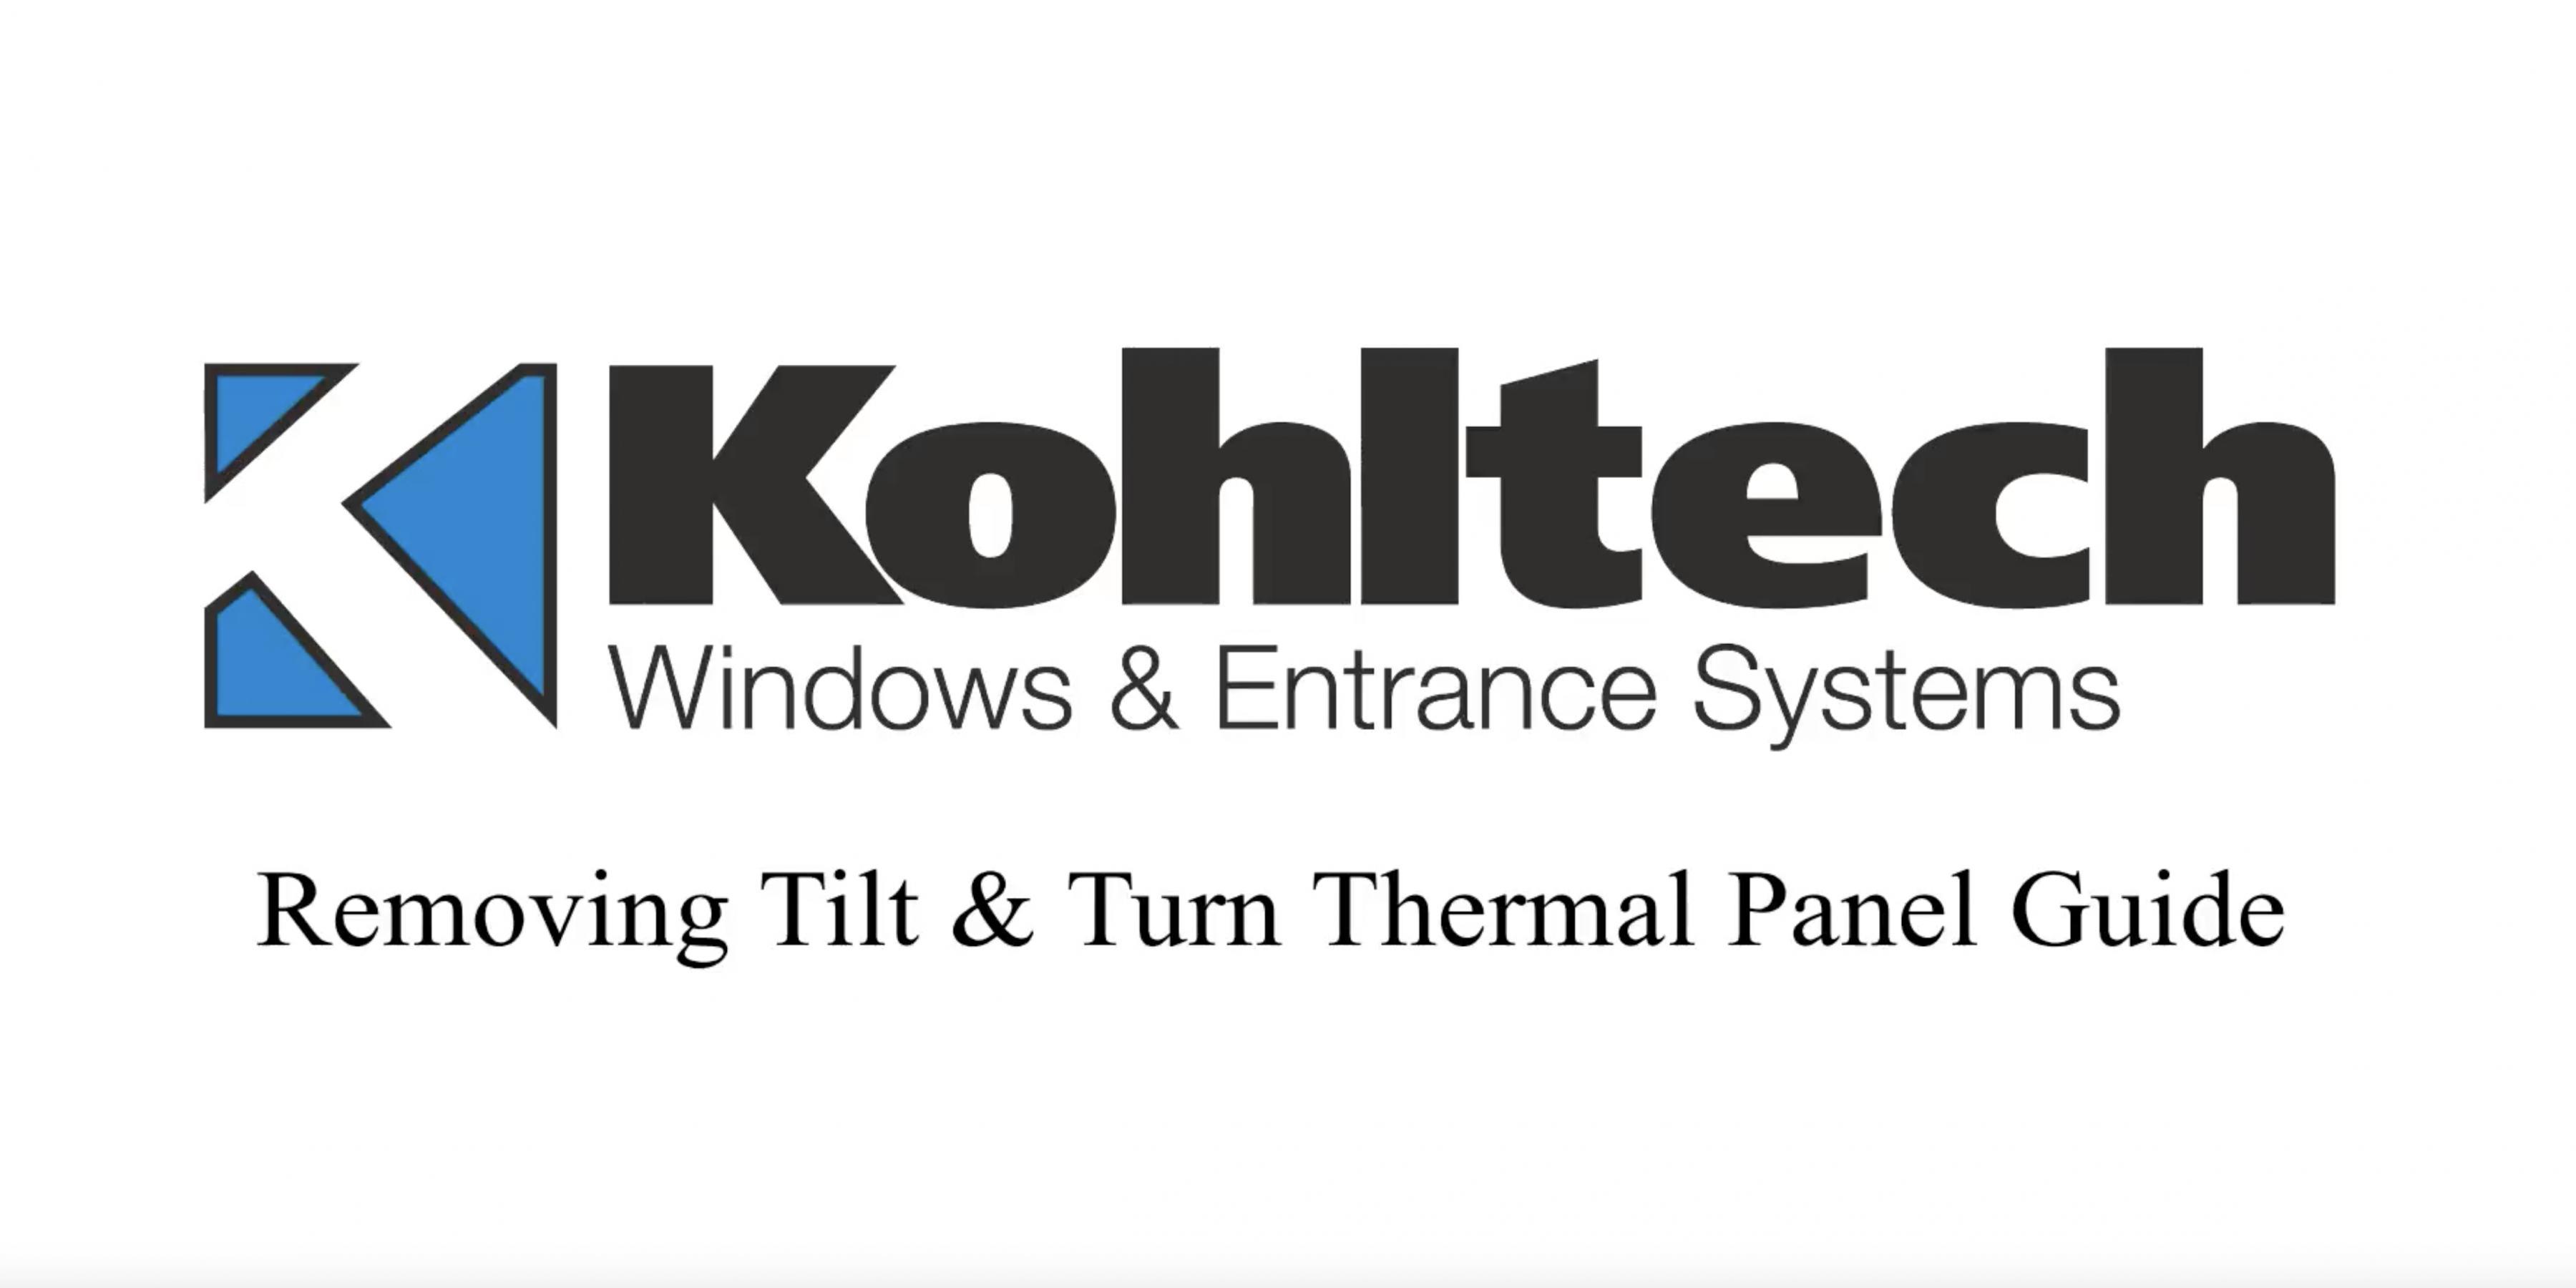 Removing Tilt & Turn Thermal Panel